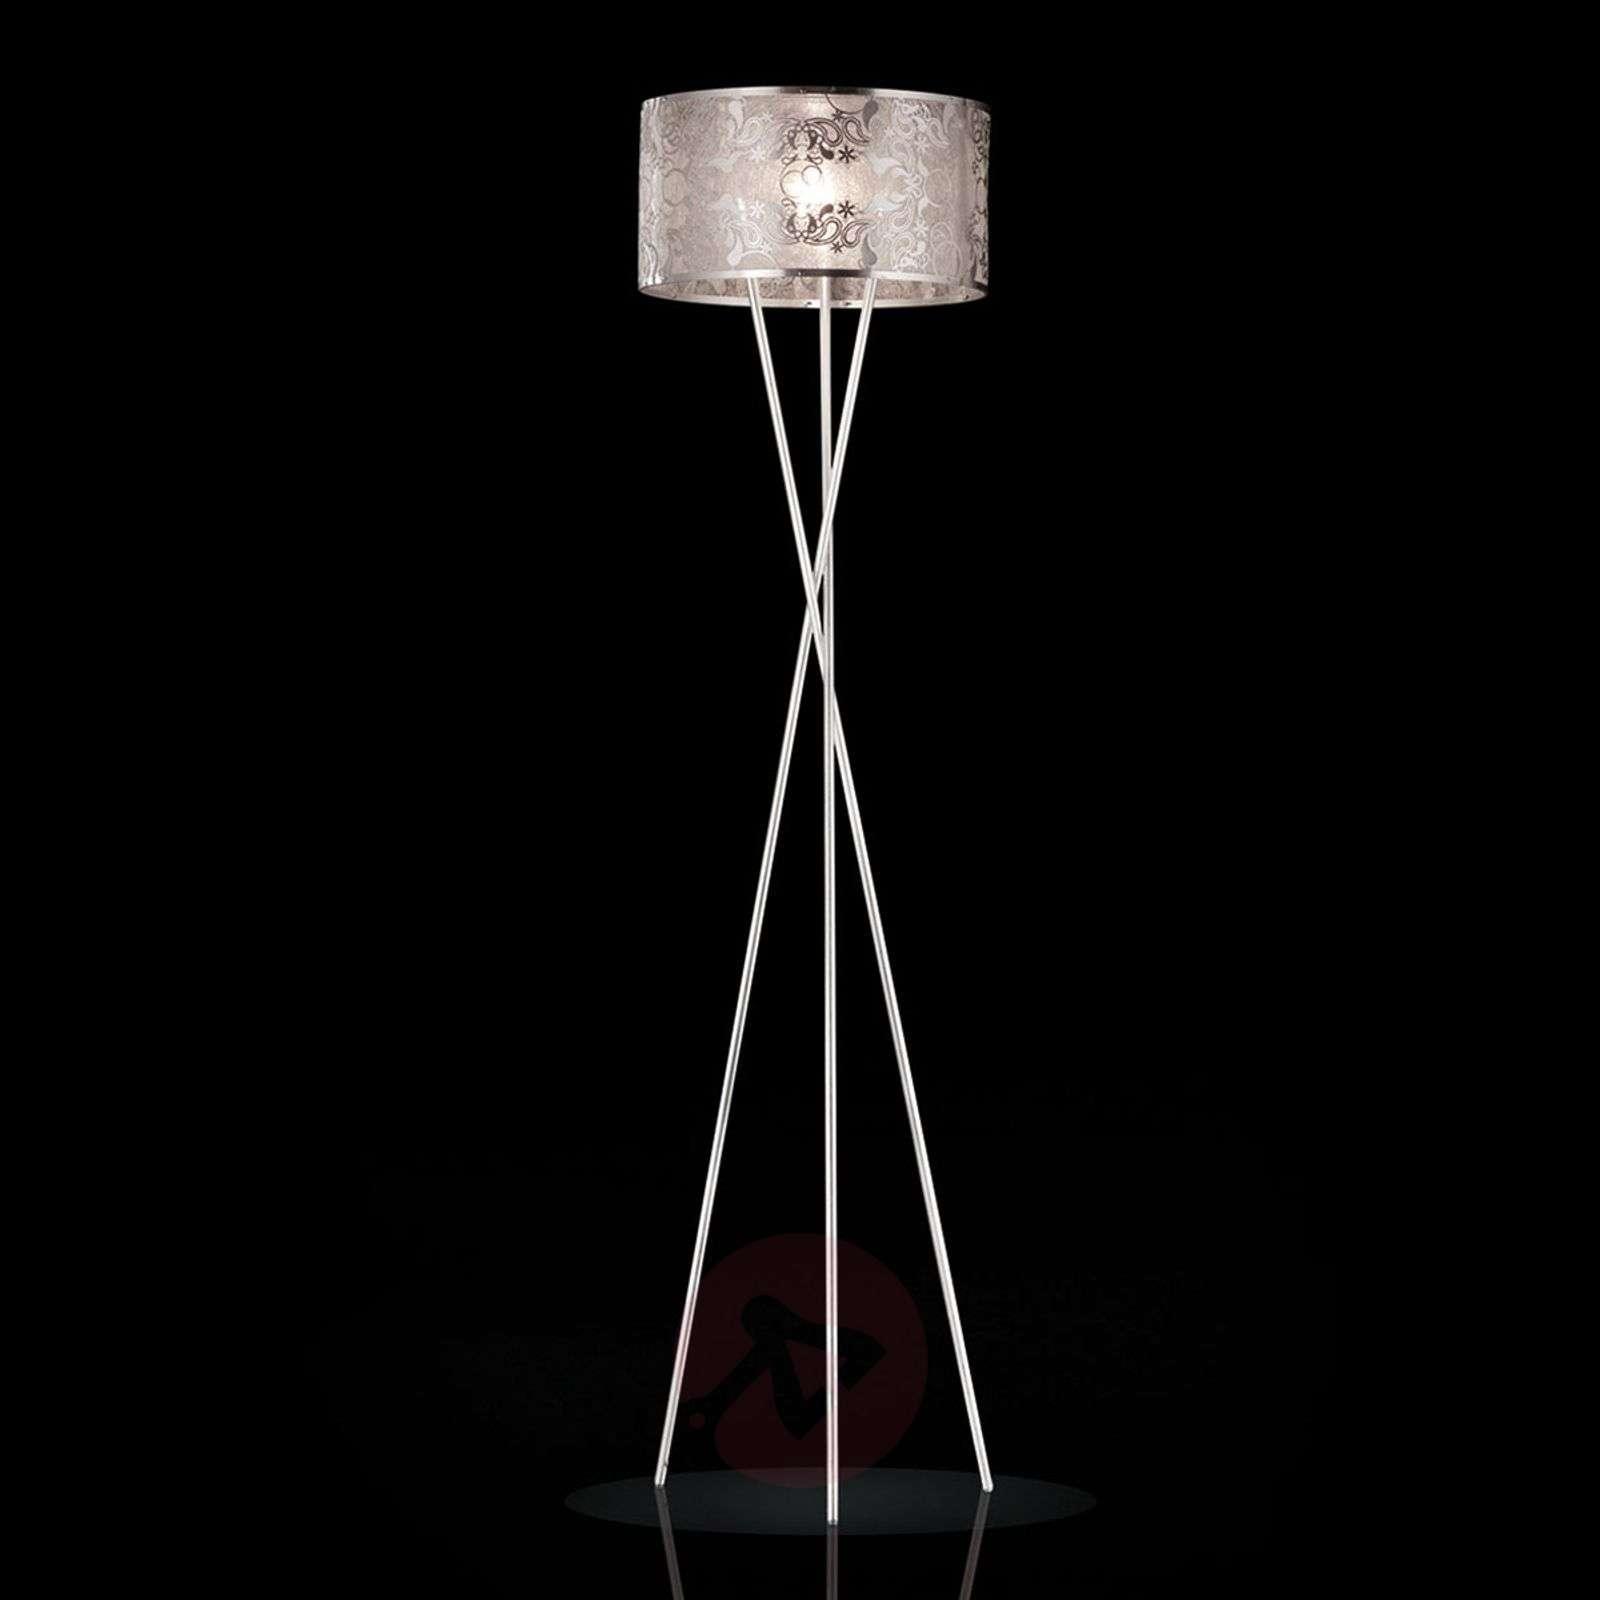 Refined floor lamp Cashmere-6532080-01